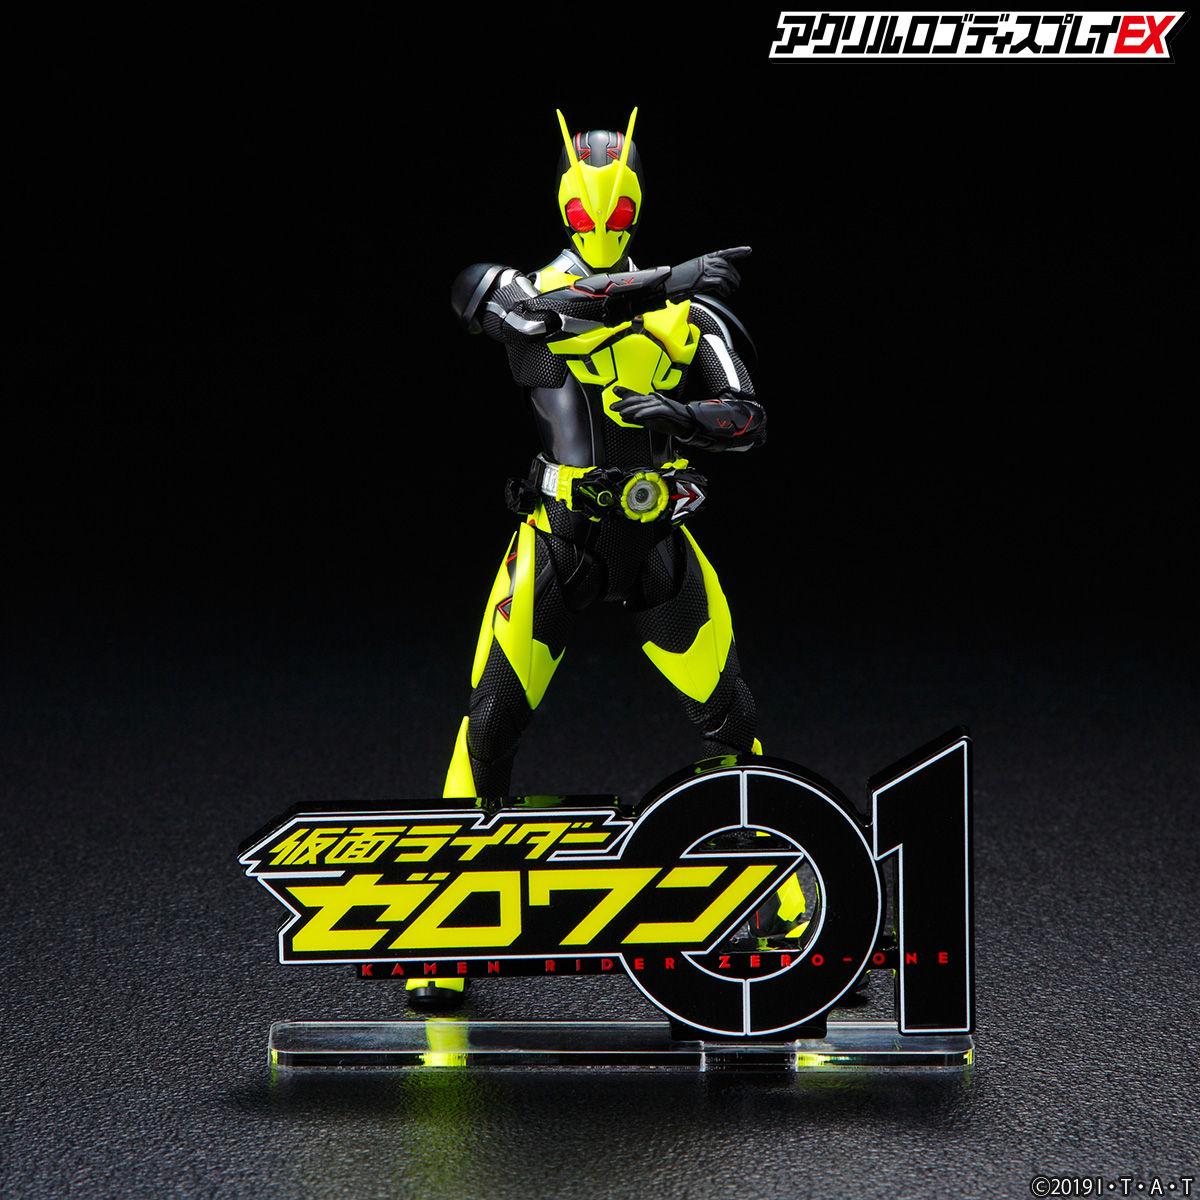 ACRYLIC LOGO DISPLAY EX 假面騎士ZERO-ONE